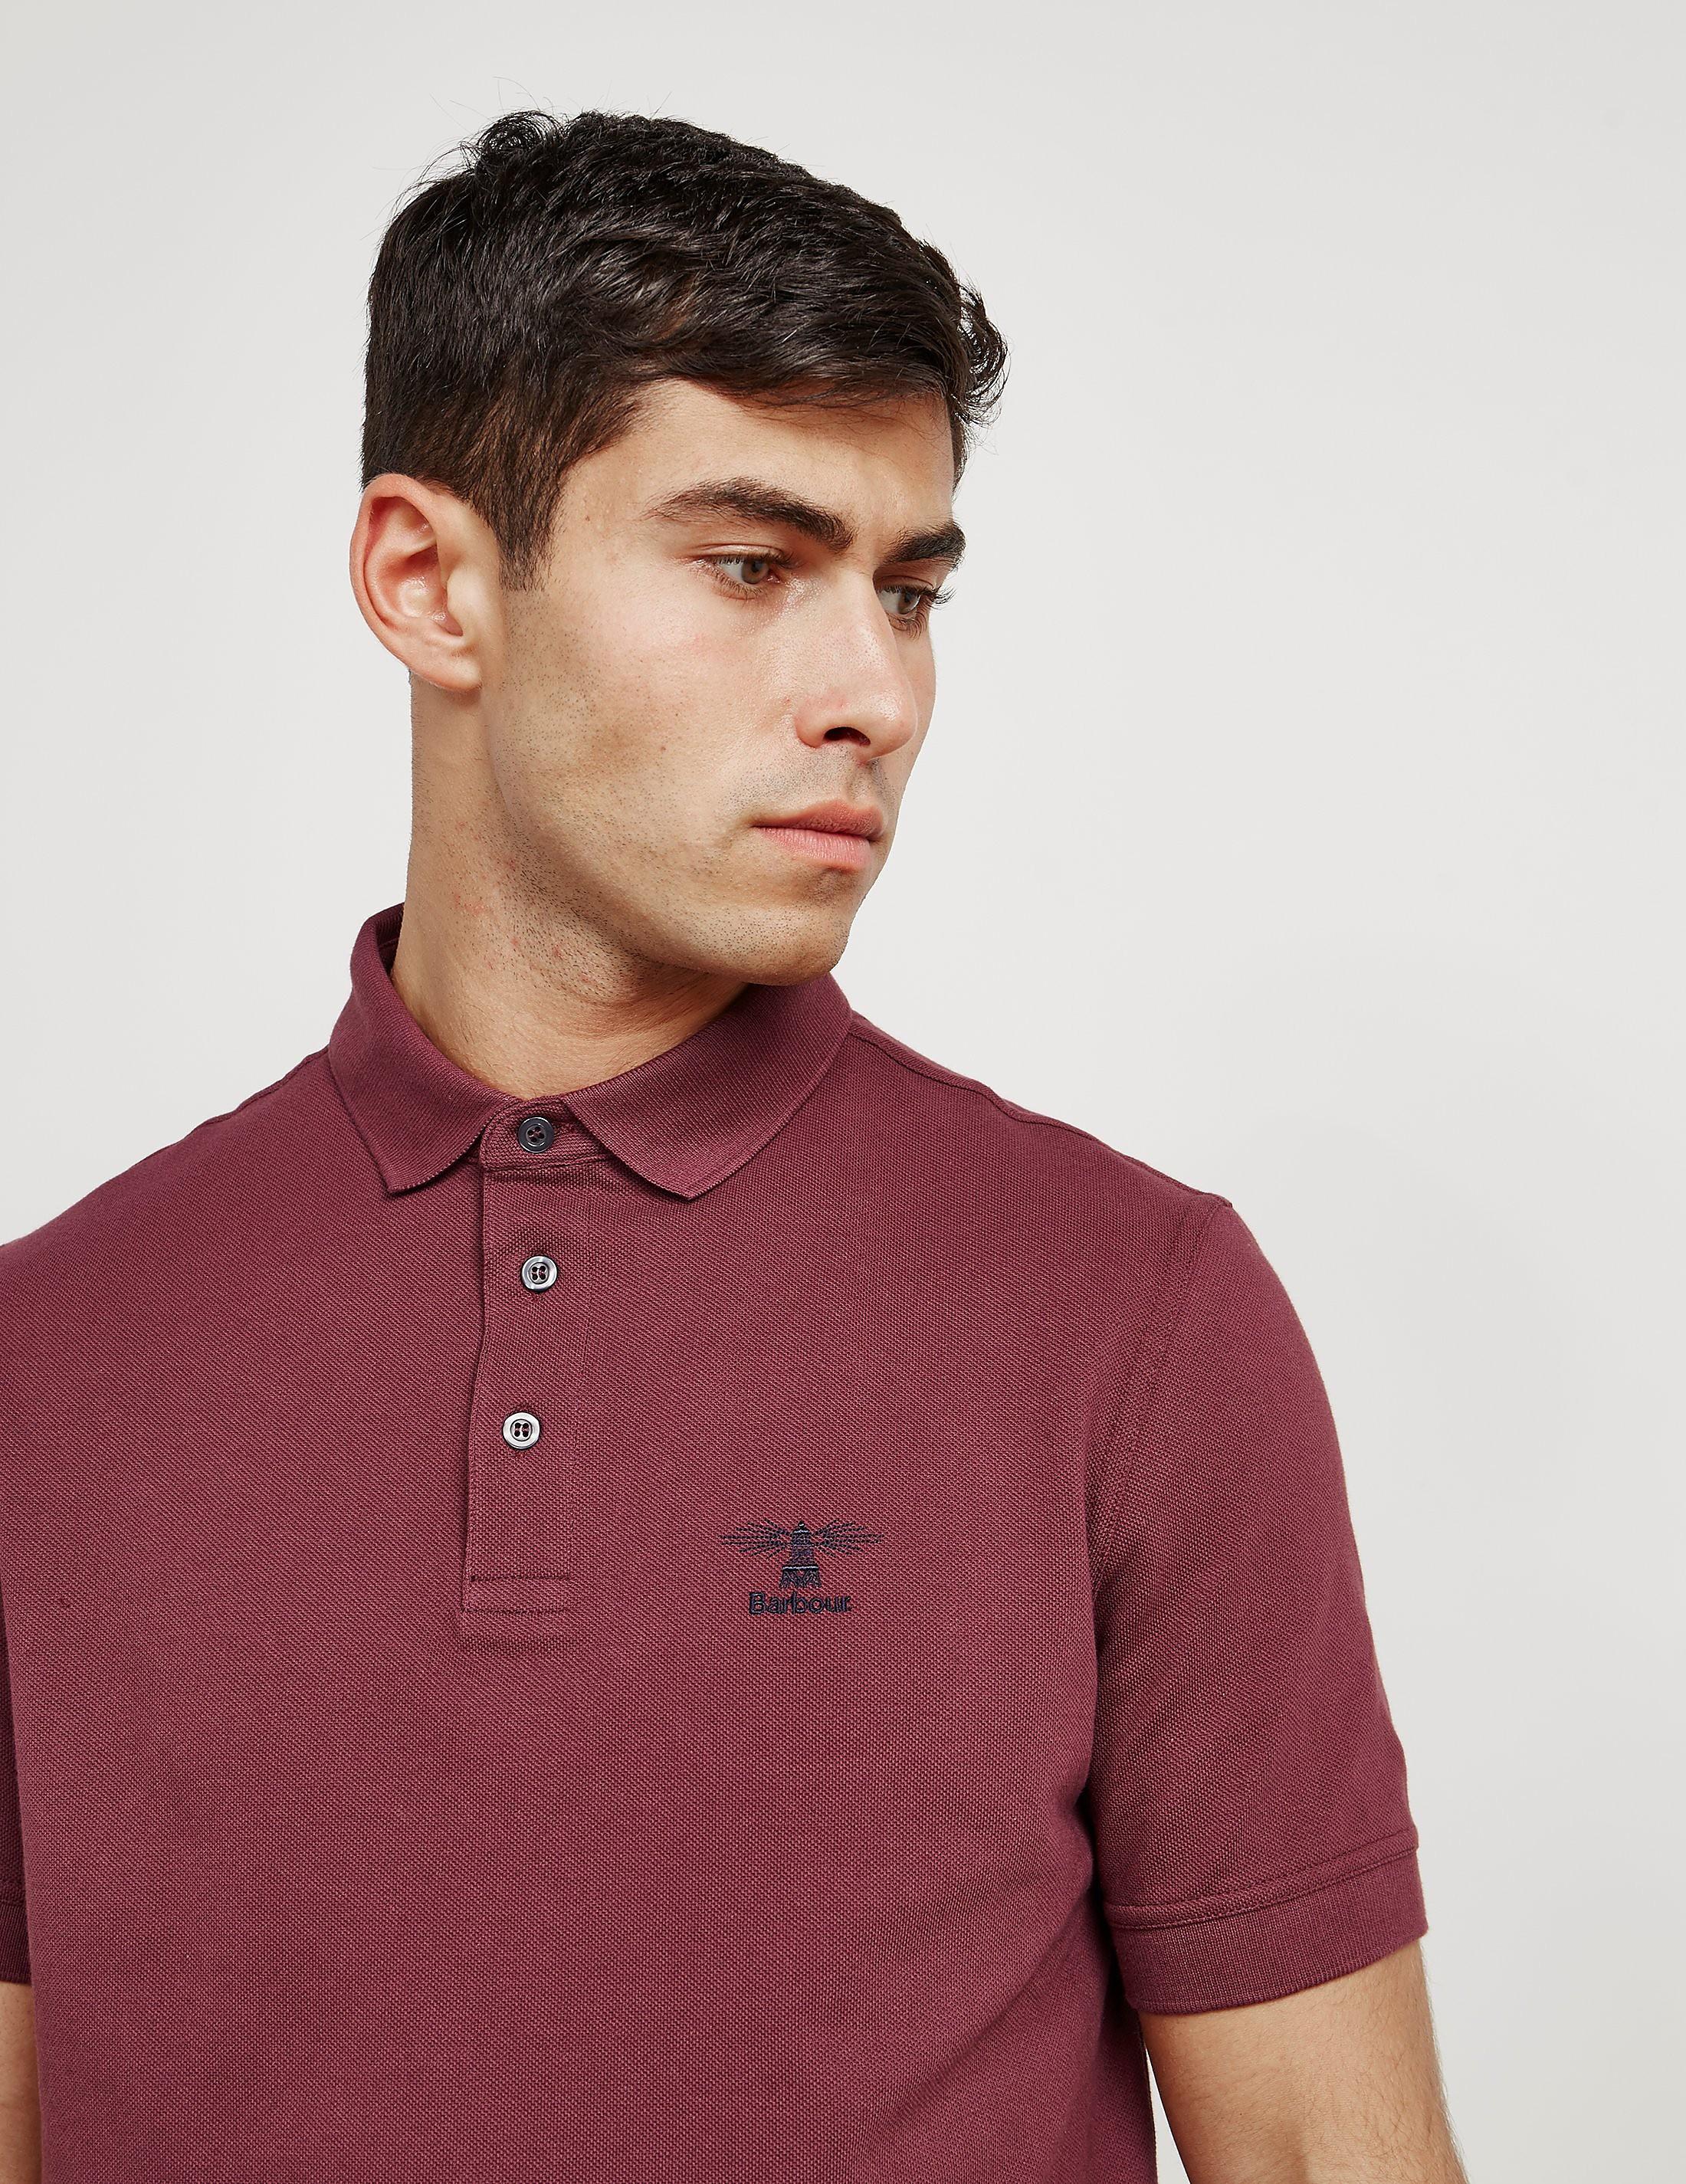 Barbour Heritage Joshua Short Sleeve Polo Shirt